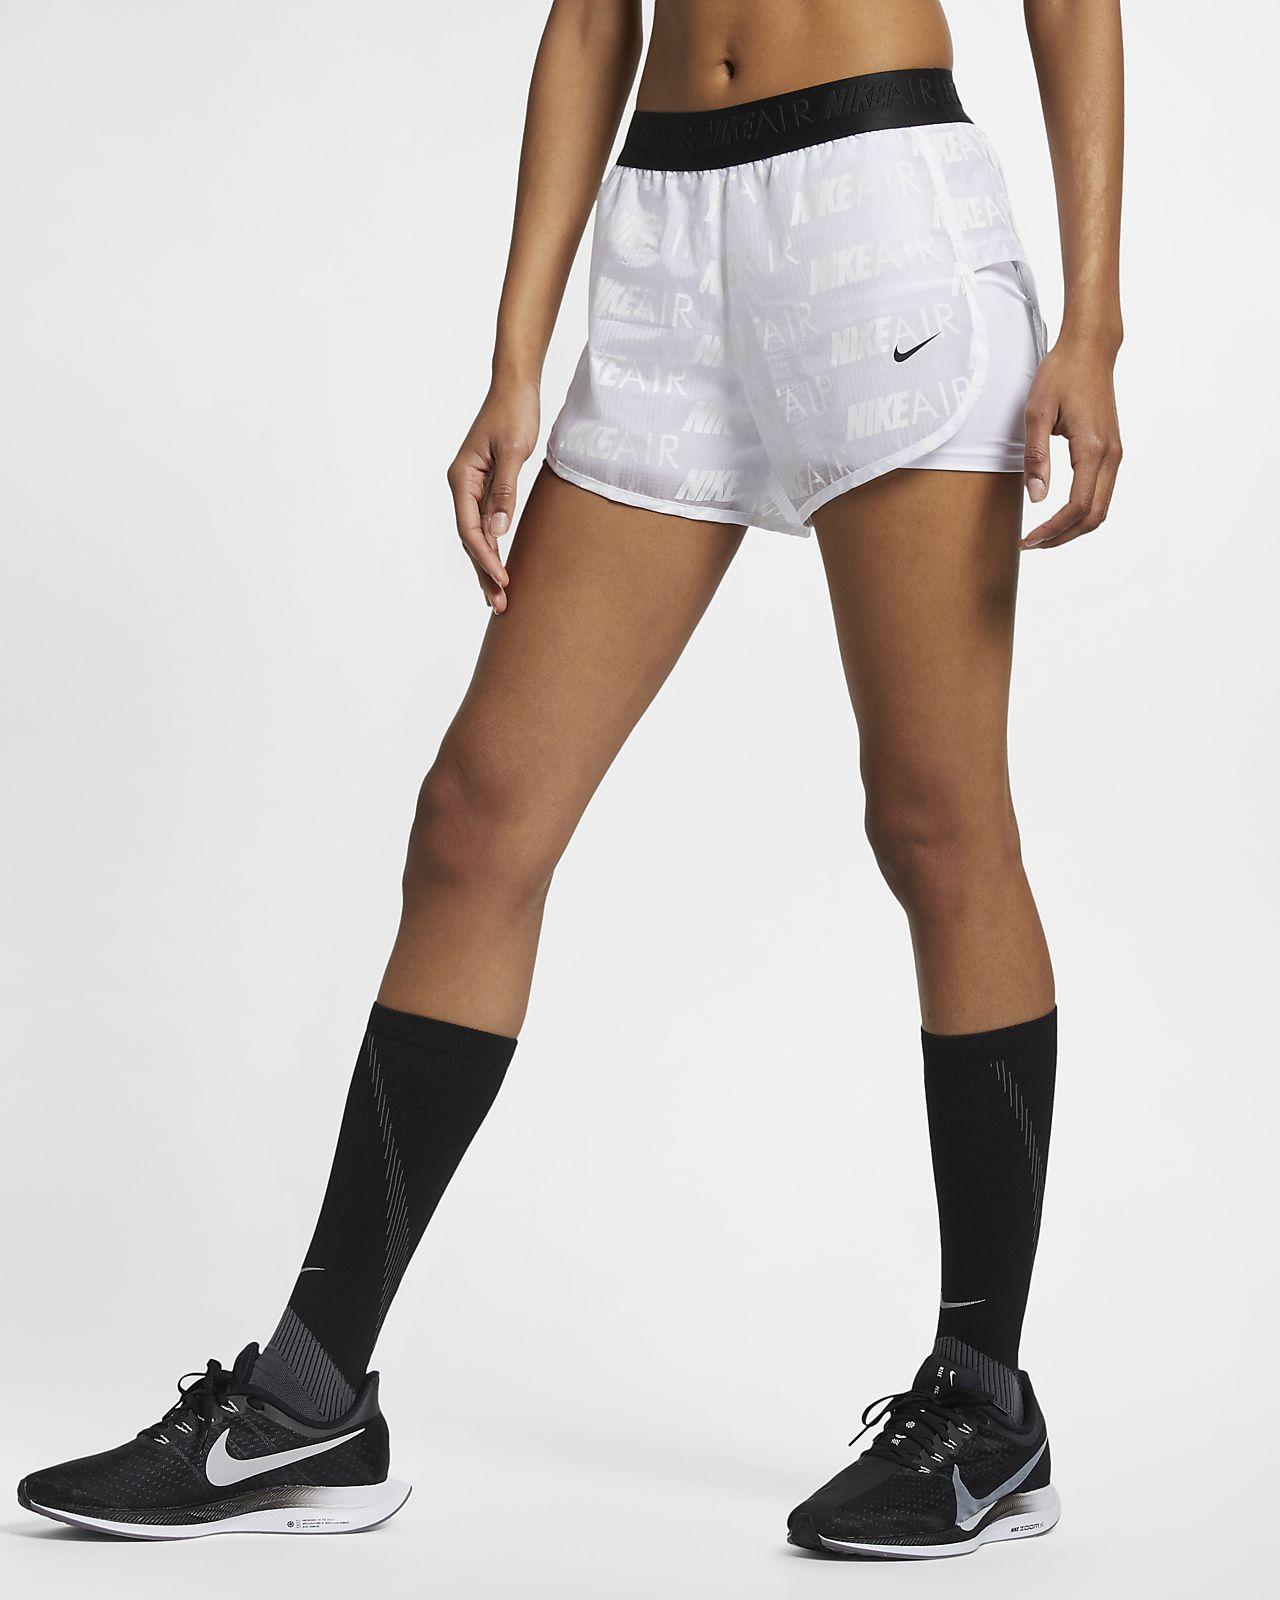 Nike Air Kadın Koşu Şortu